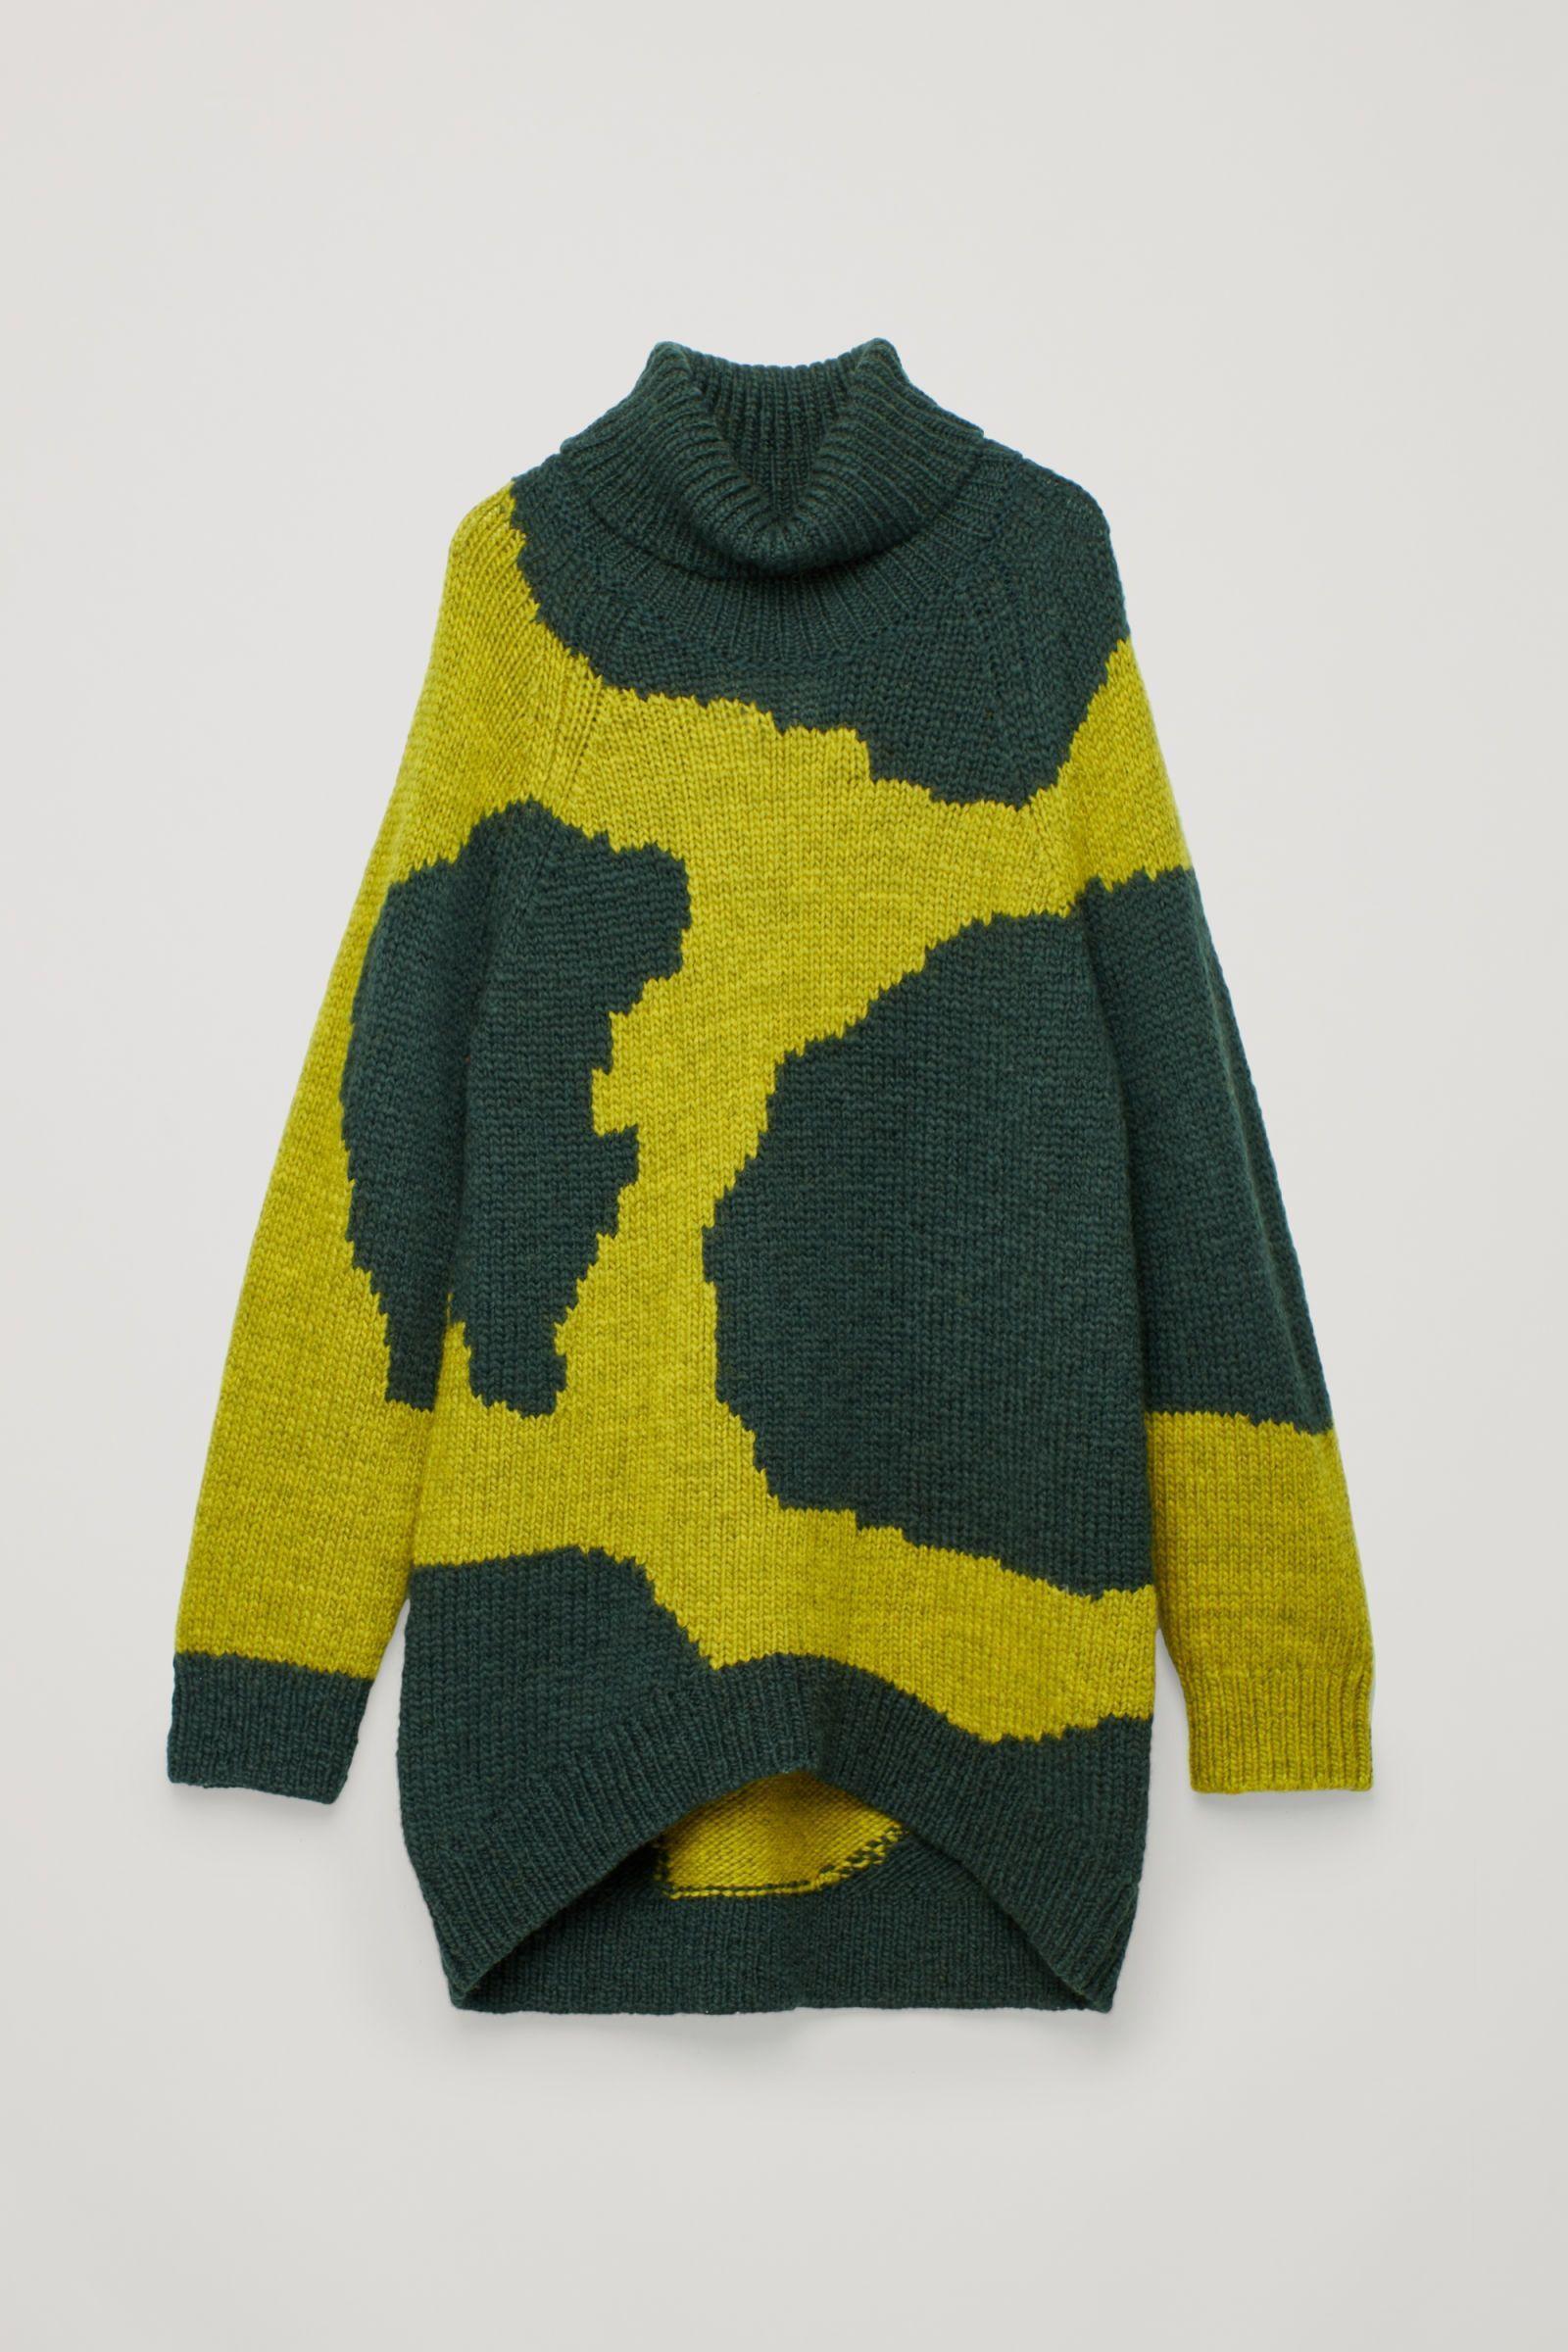 COS   Intarsia wool roll-neck jumper   Fashion   Knitting, Knitwear ... 442a6410e5c4